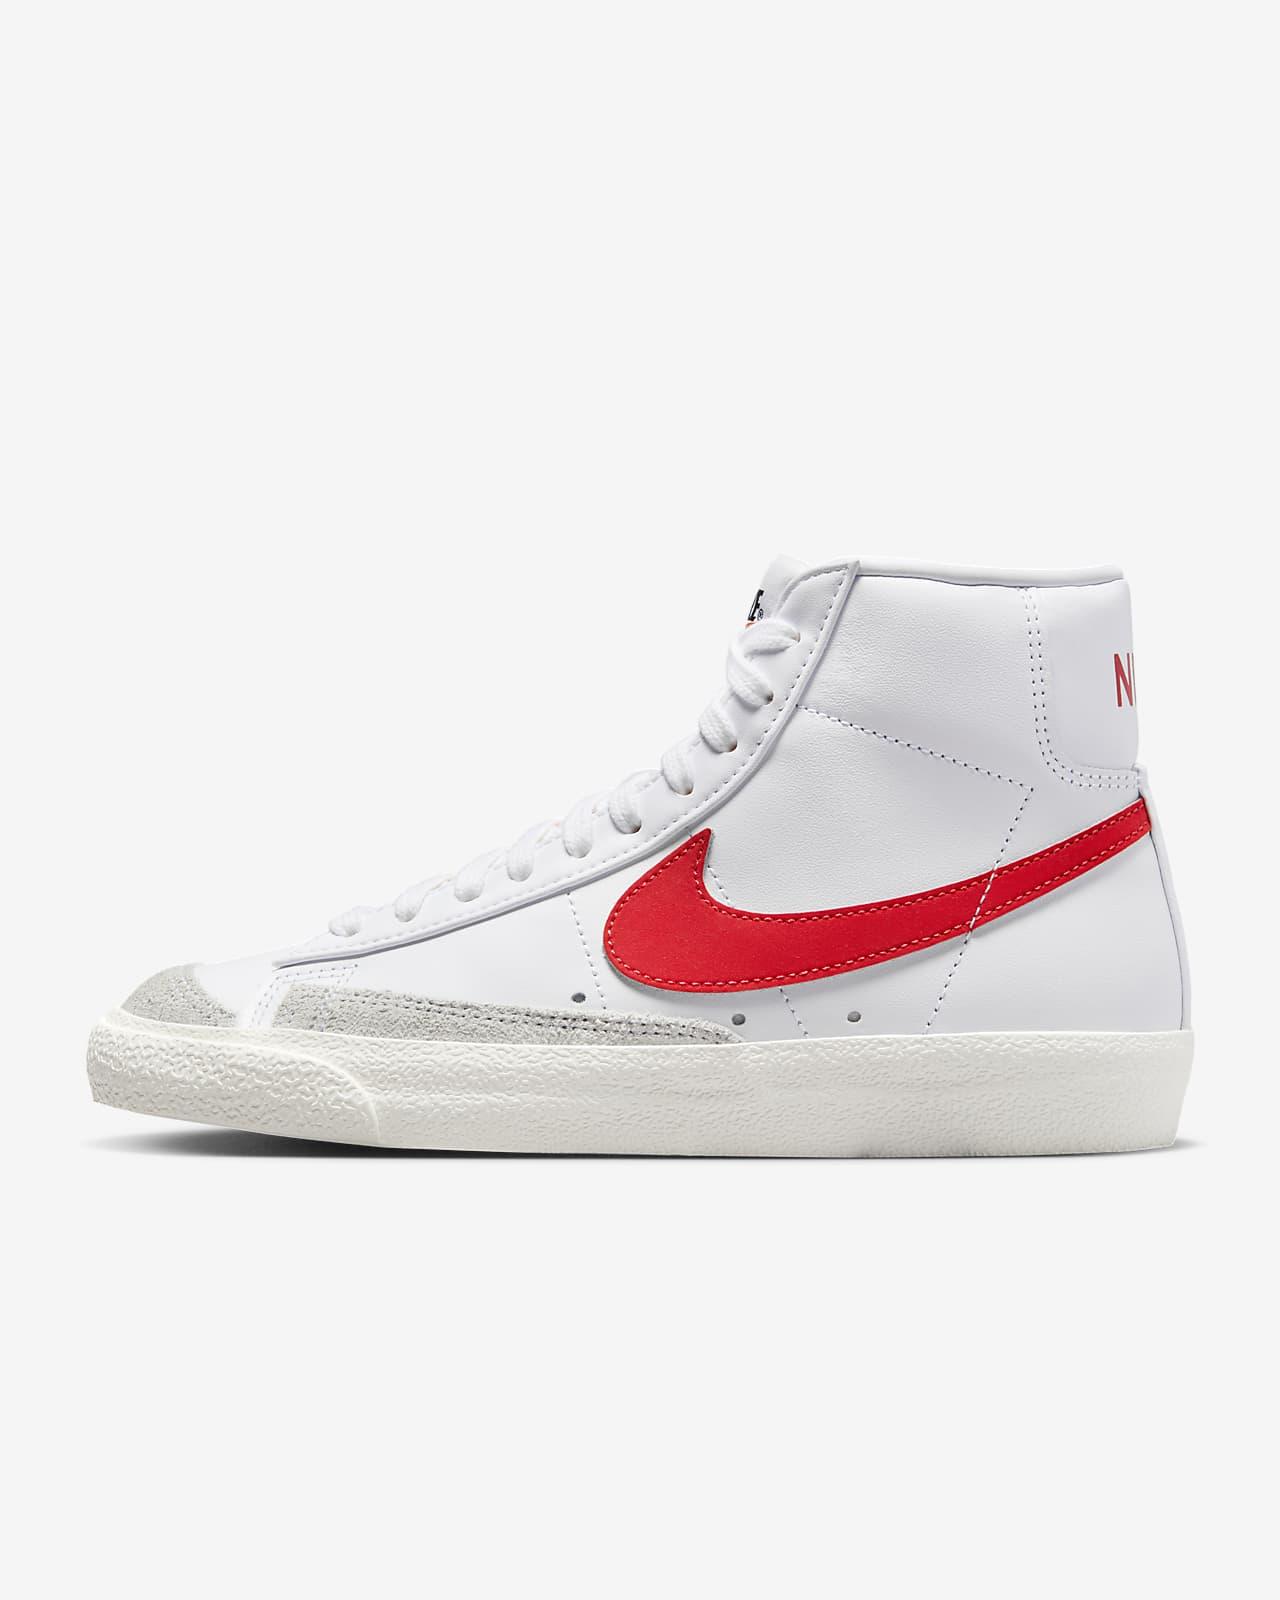 Nike Blazer Mid '77 Vintage Women's Shoes